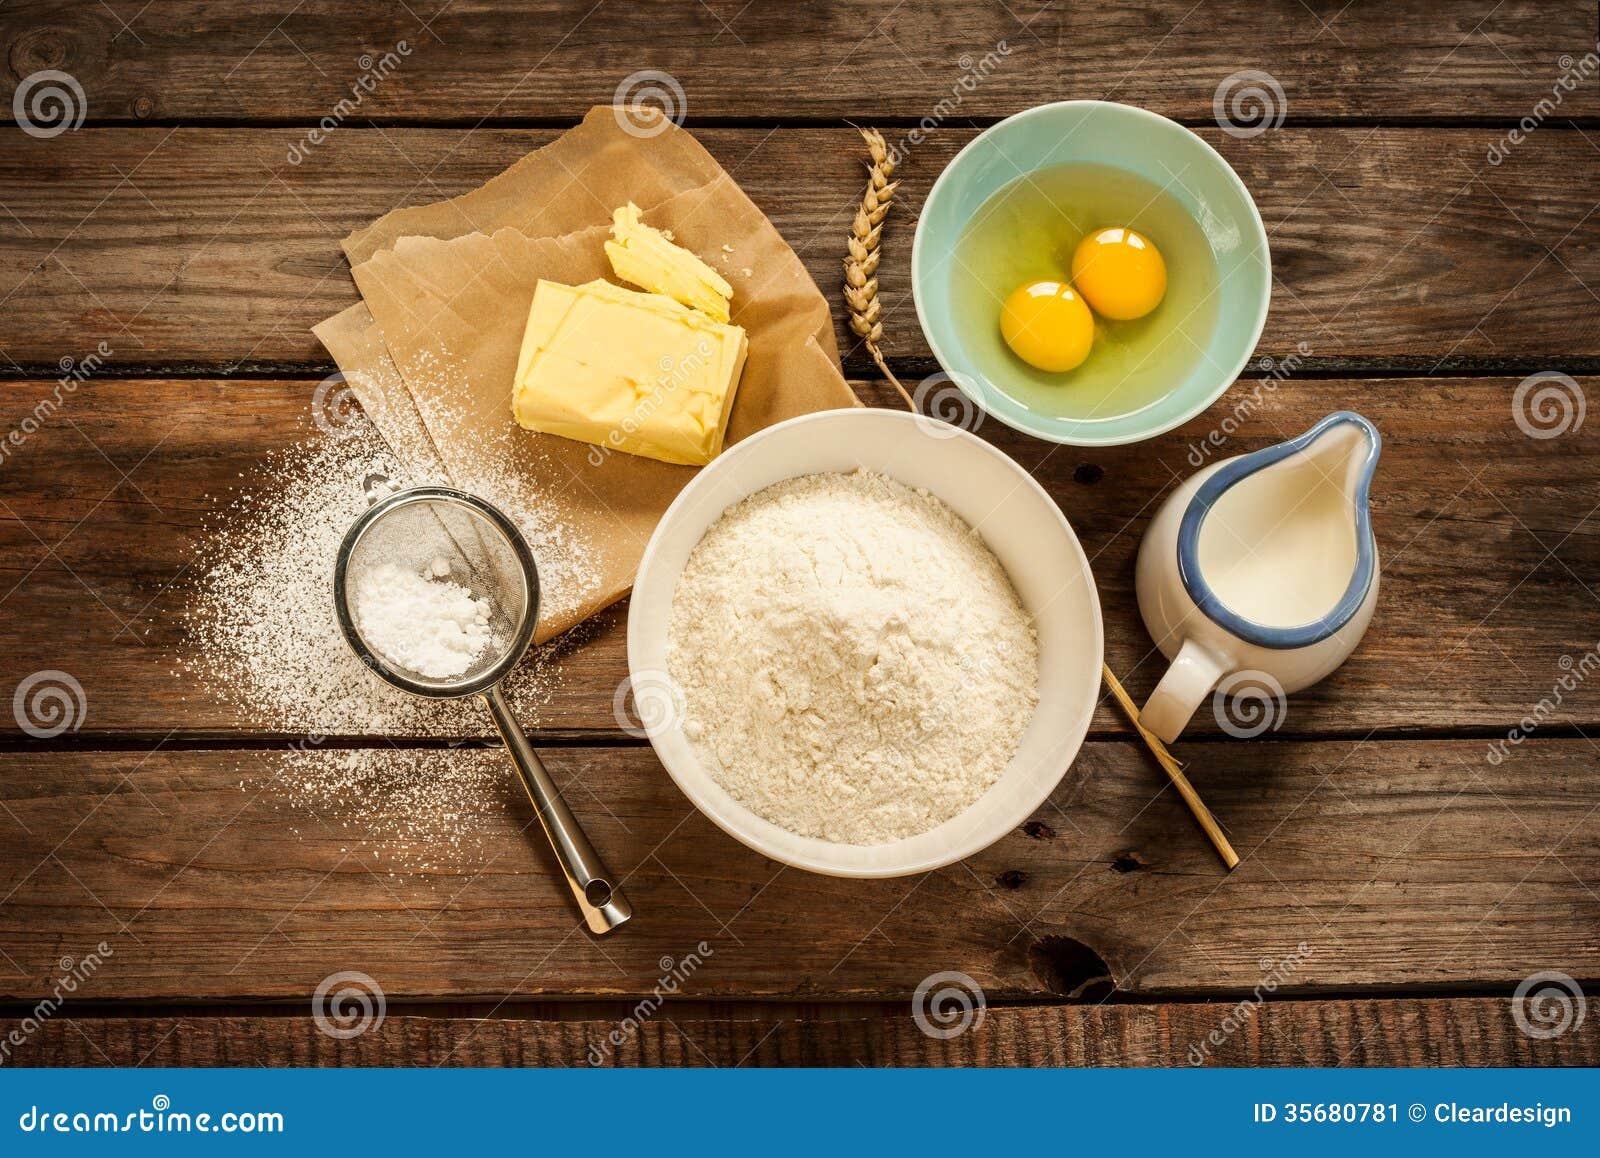 dough recipe ingredients on vintage rural wood kitchen table stock image